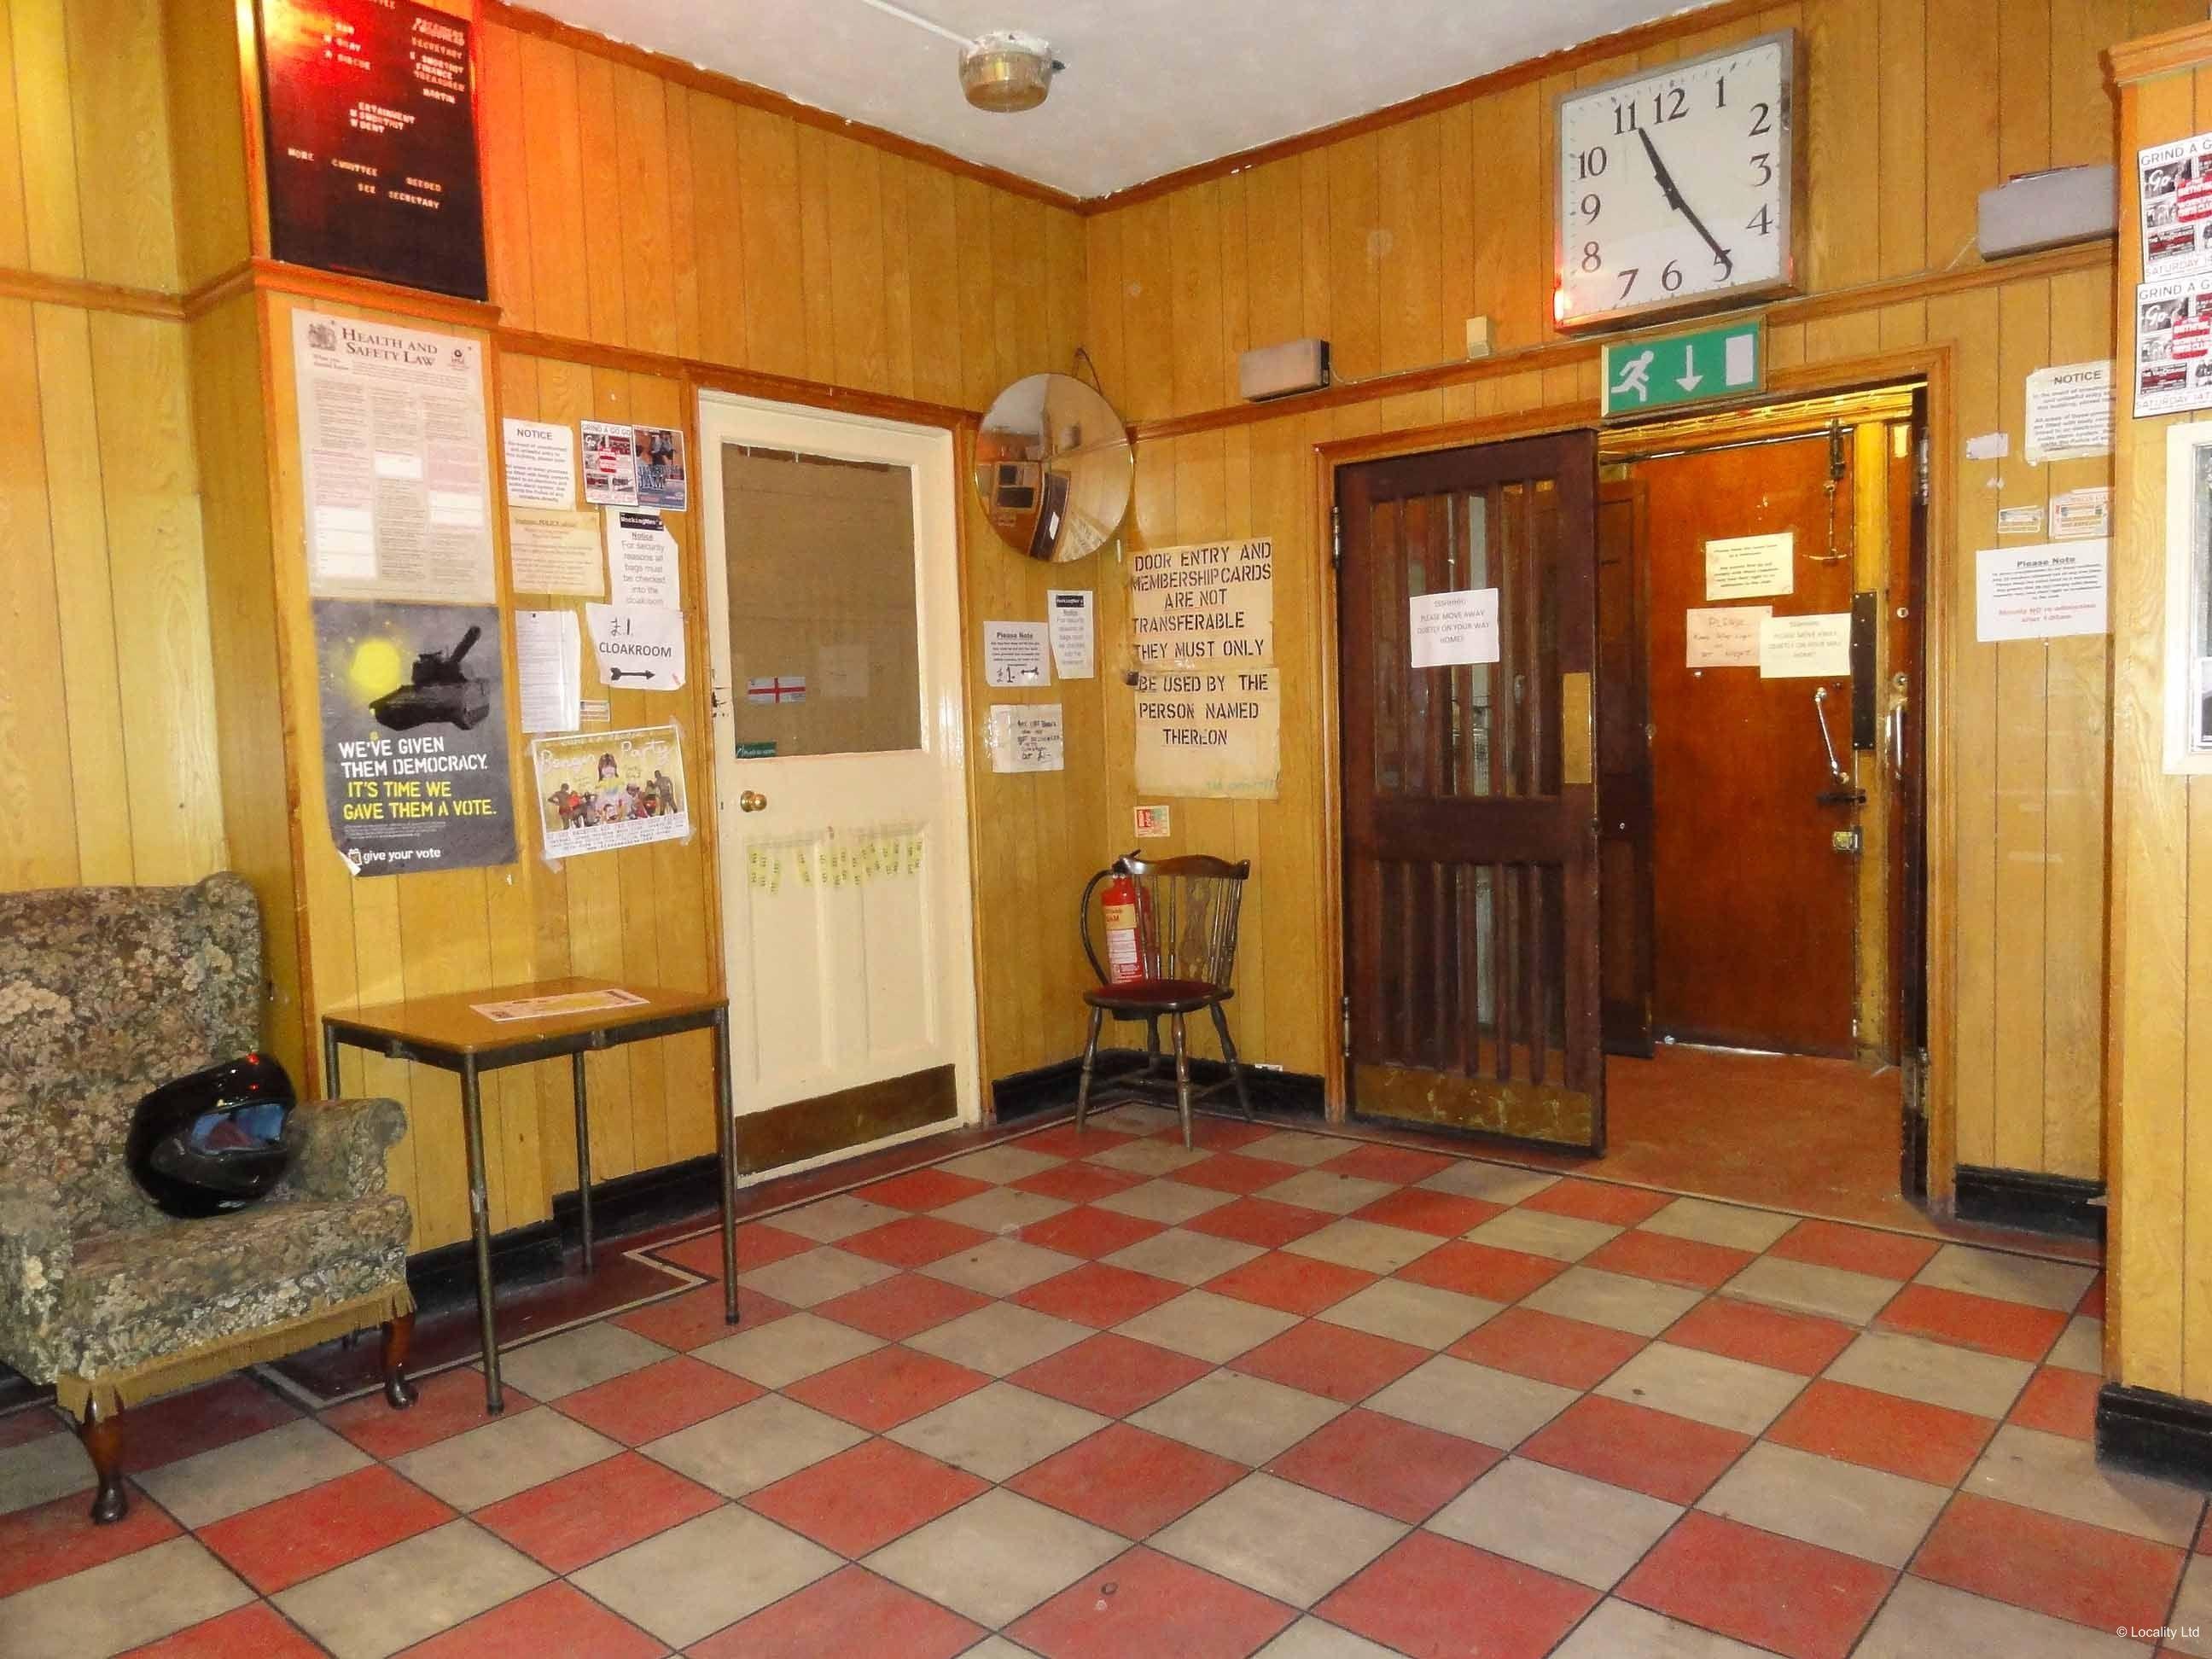 Tower Hamlets C Club Furniture Social Club Bethnal Green